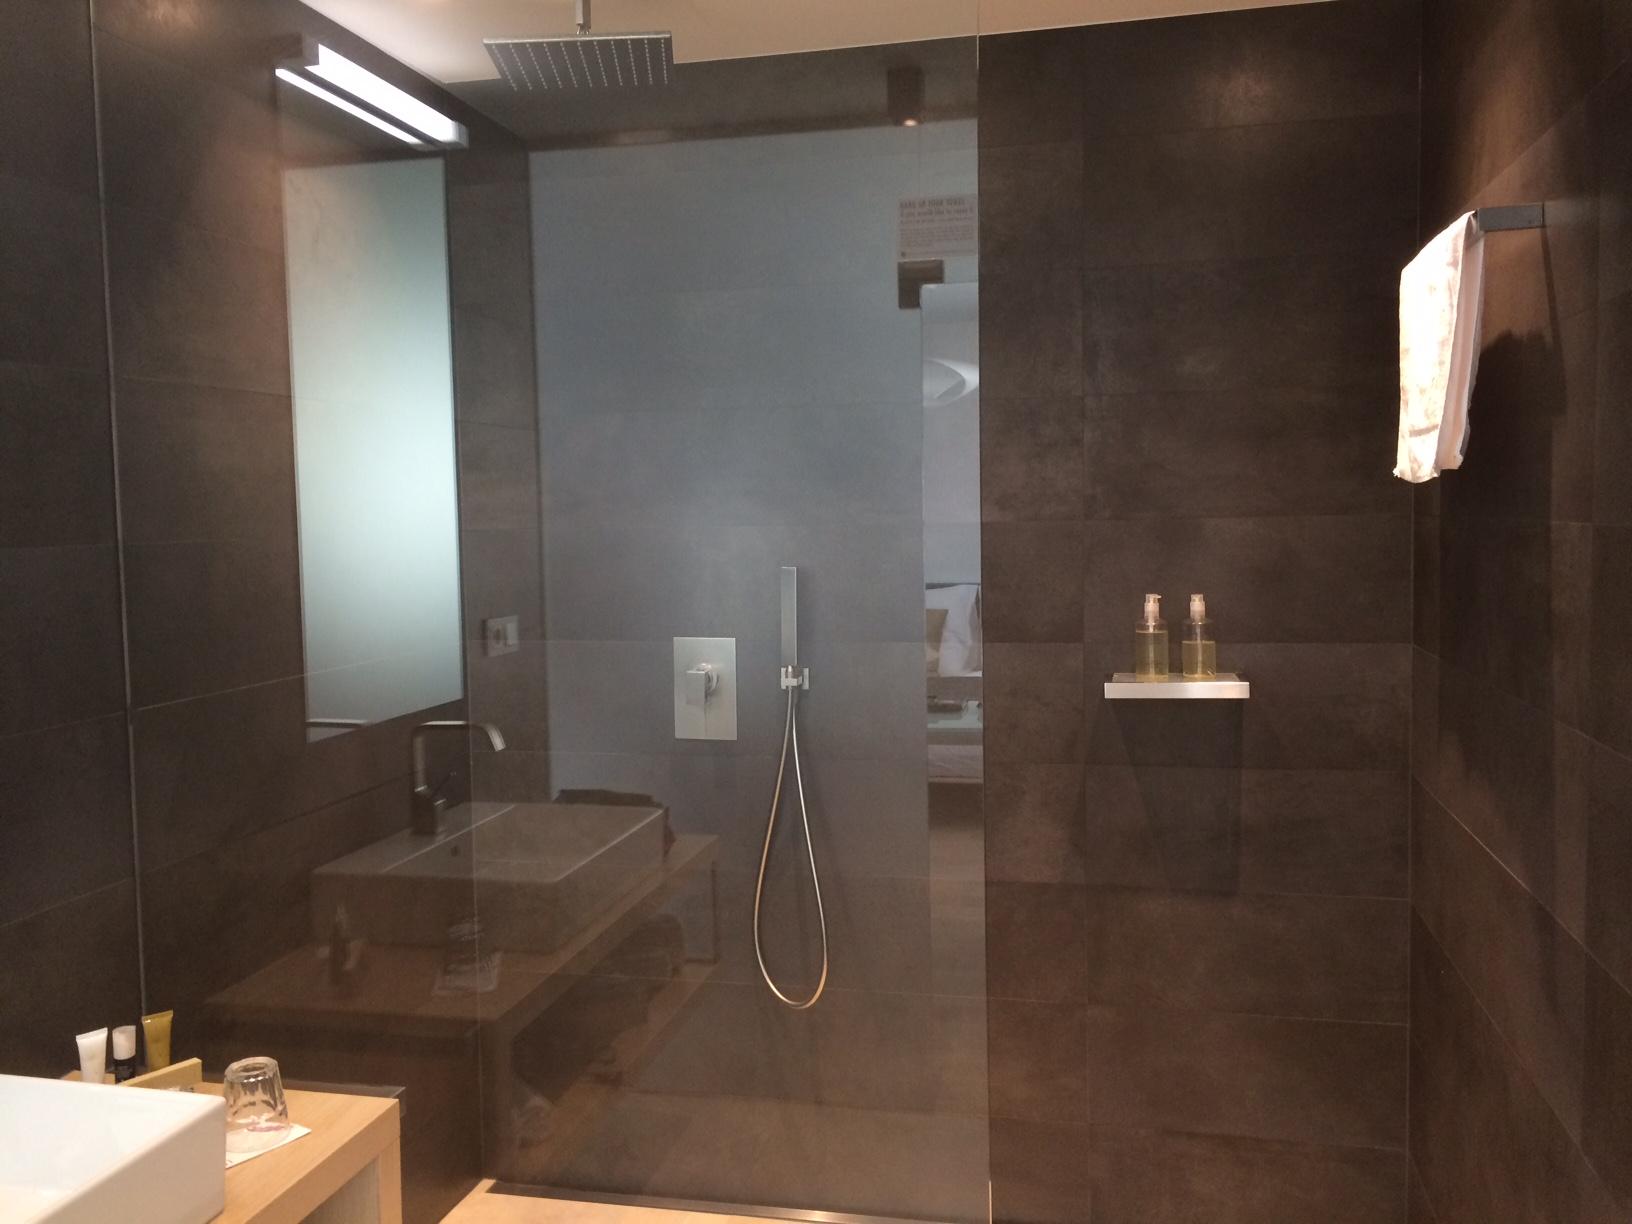 The insanely amazing rainhead shower